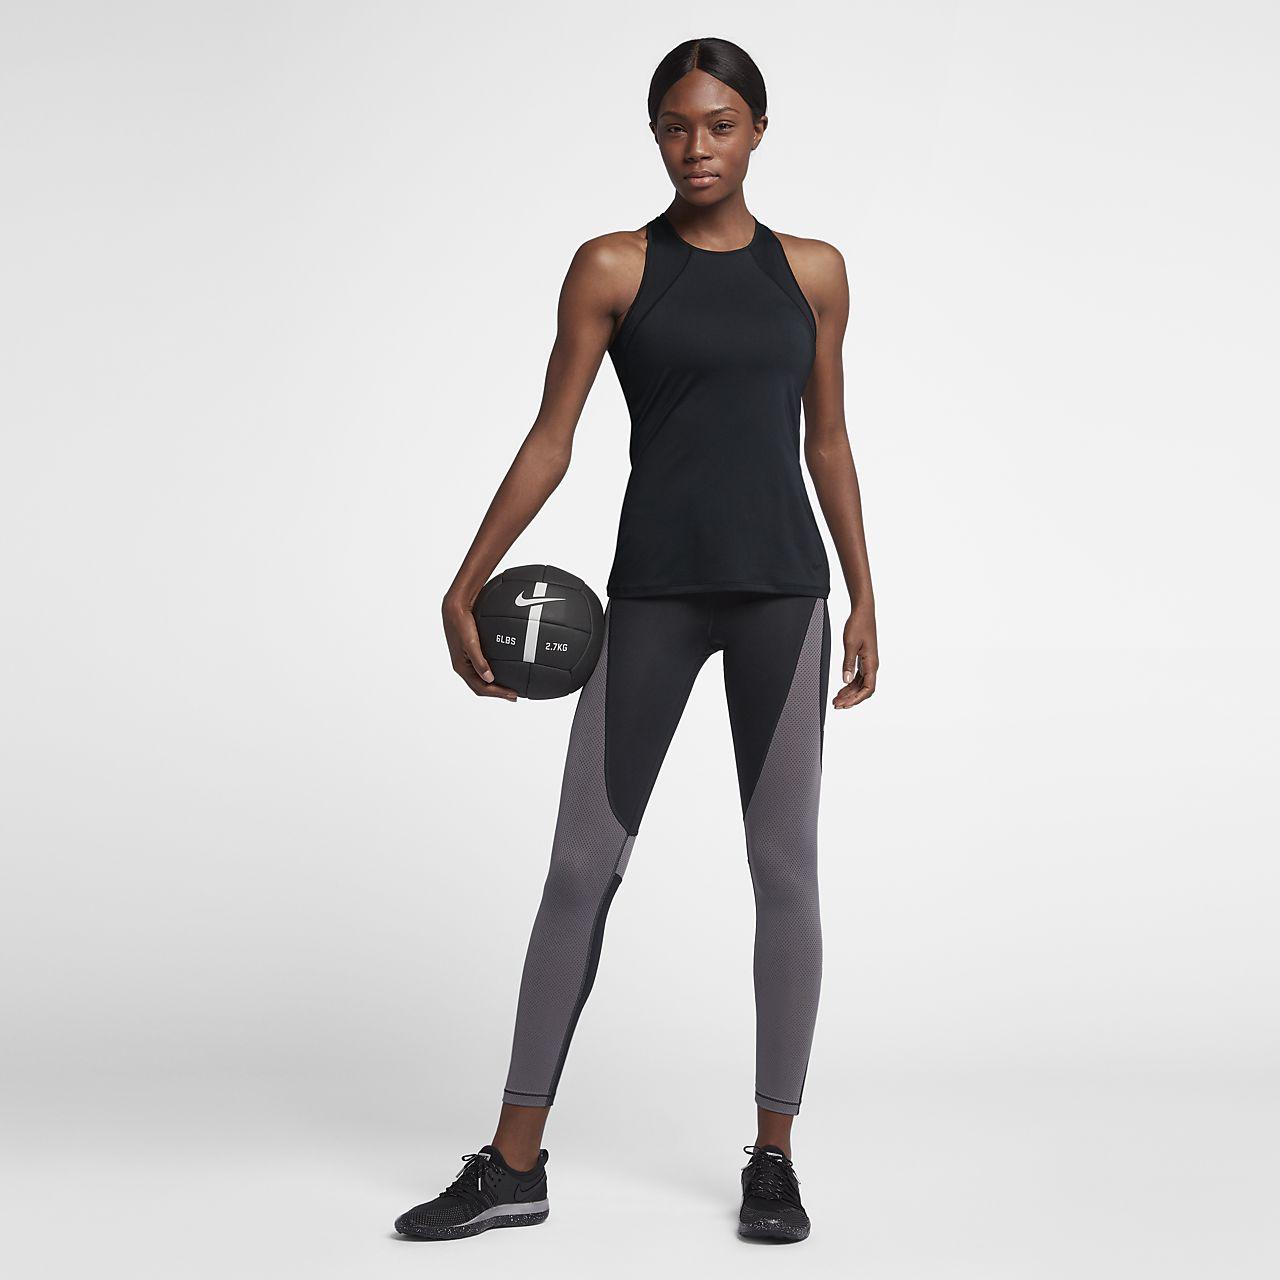 780ea5046c024 Nike Pro HyperCool Women s Training Tank. Nike.com CA